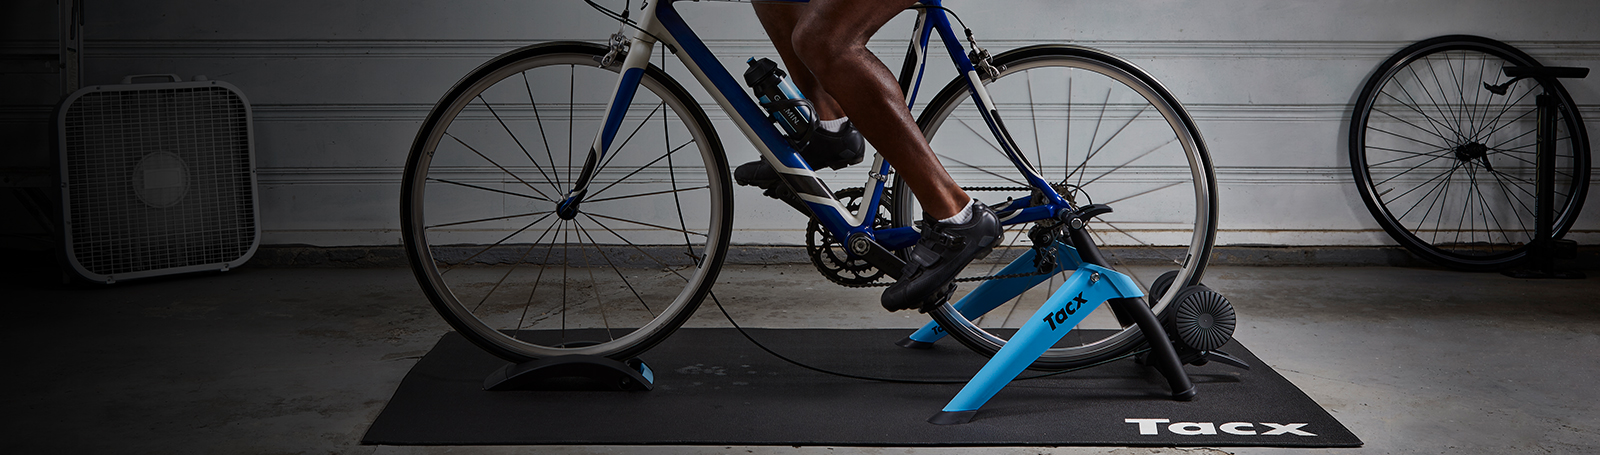 Trenażer rowerowy Tacx Boost